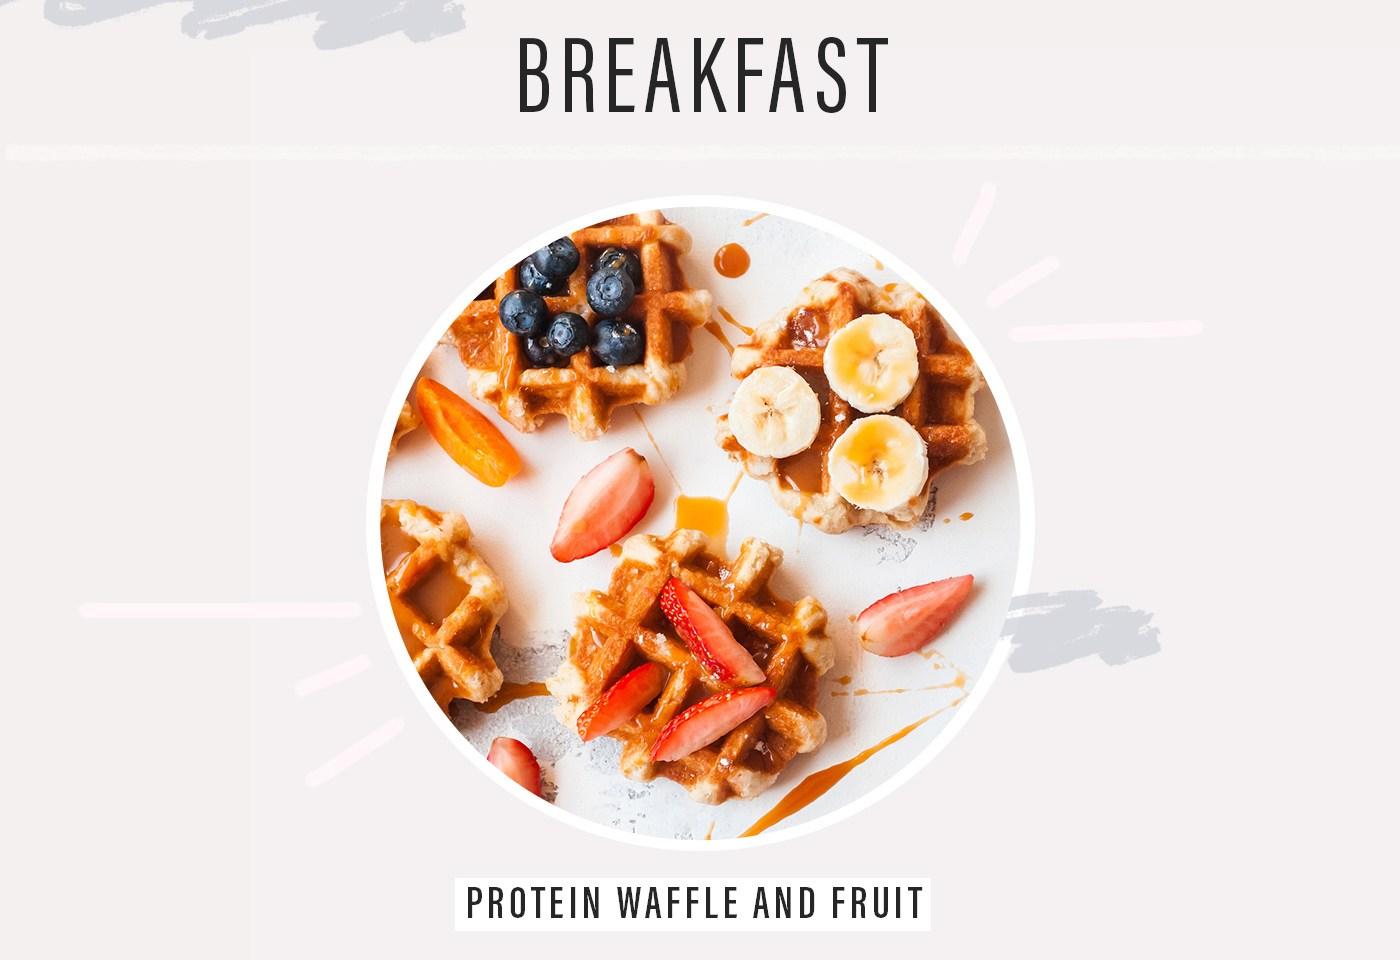 simone biles breakfast